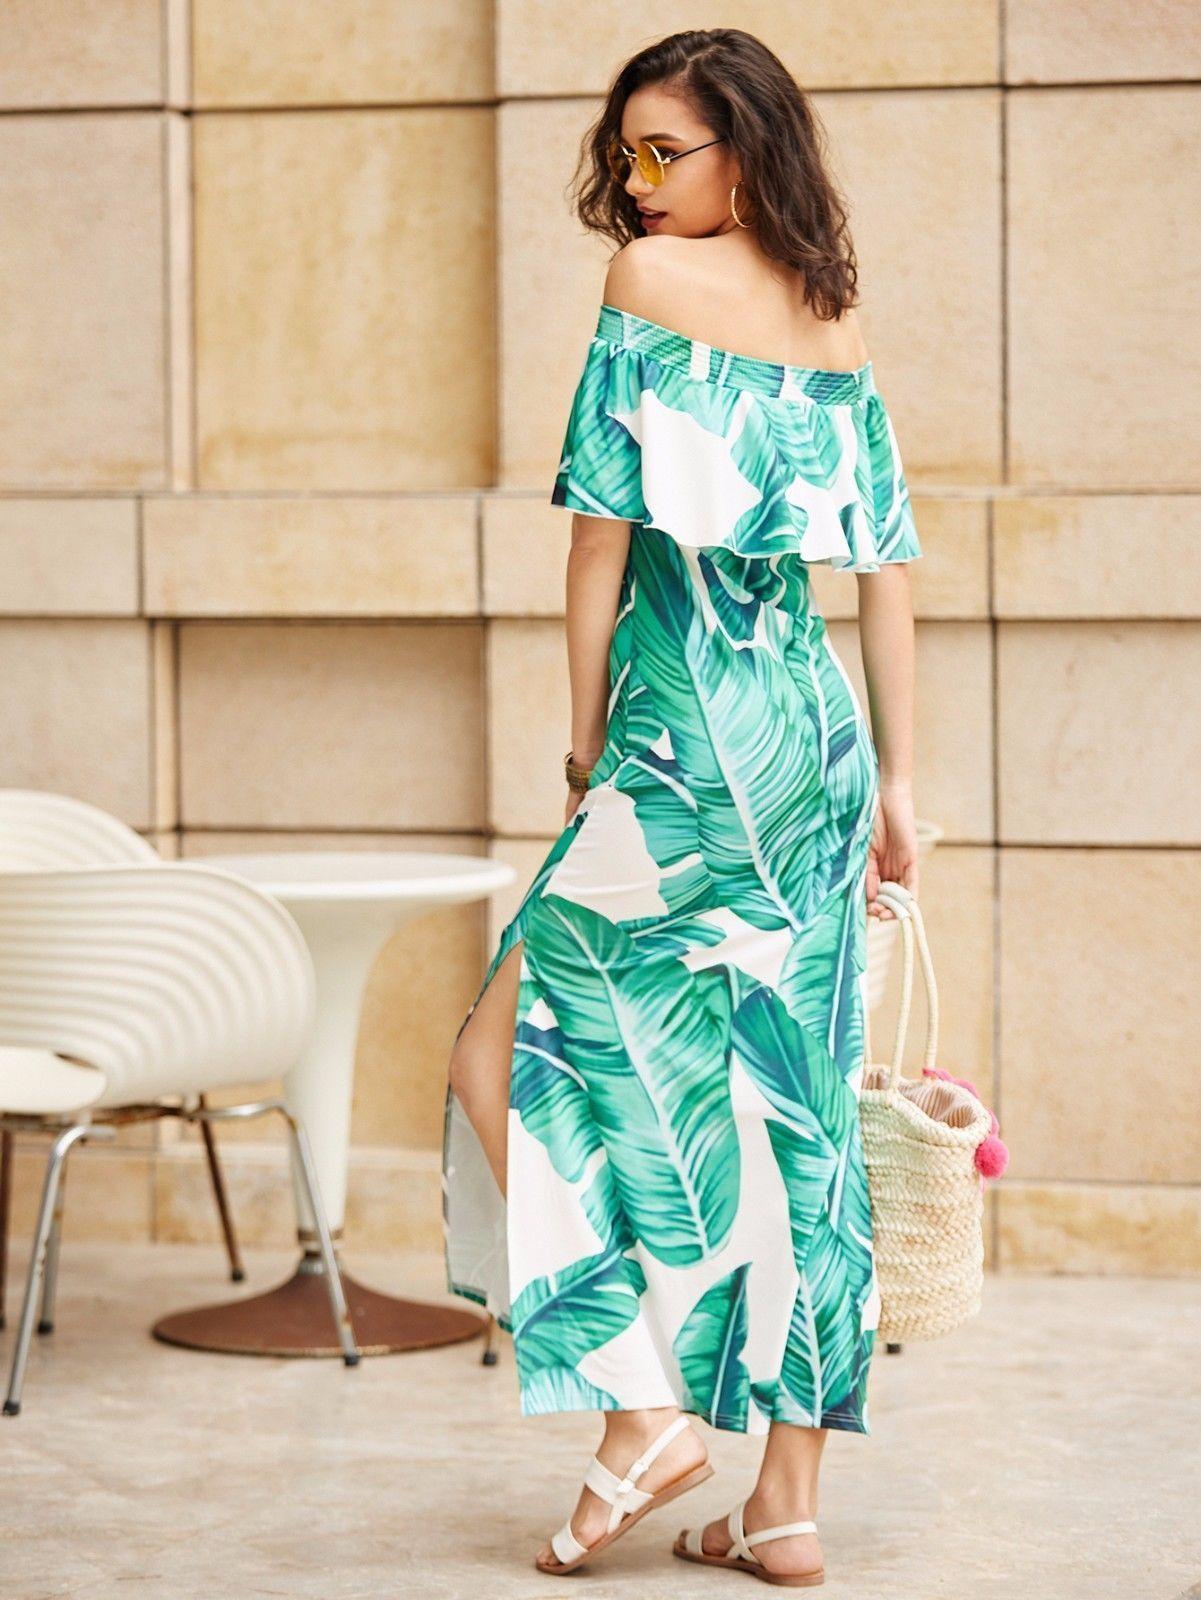 d82f086c59d Green Palm Leaf Print Side Slit Flounce Off Shoulder Bardot A Line Maxi  Dress | eBay